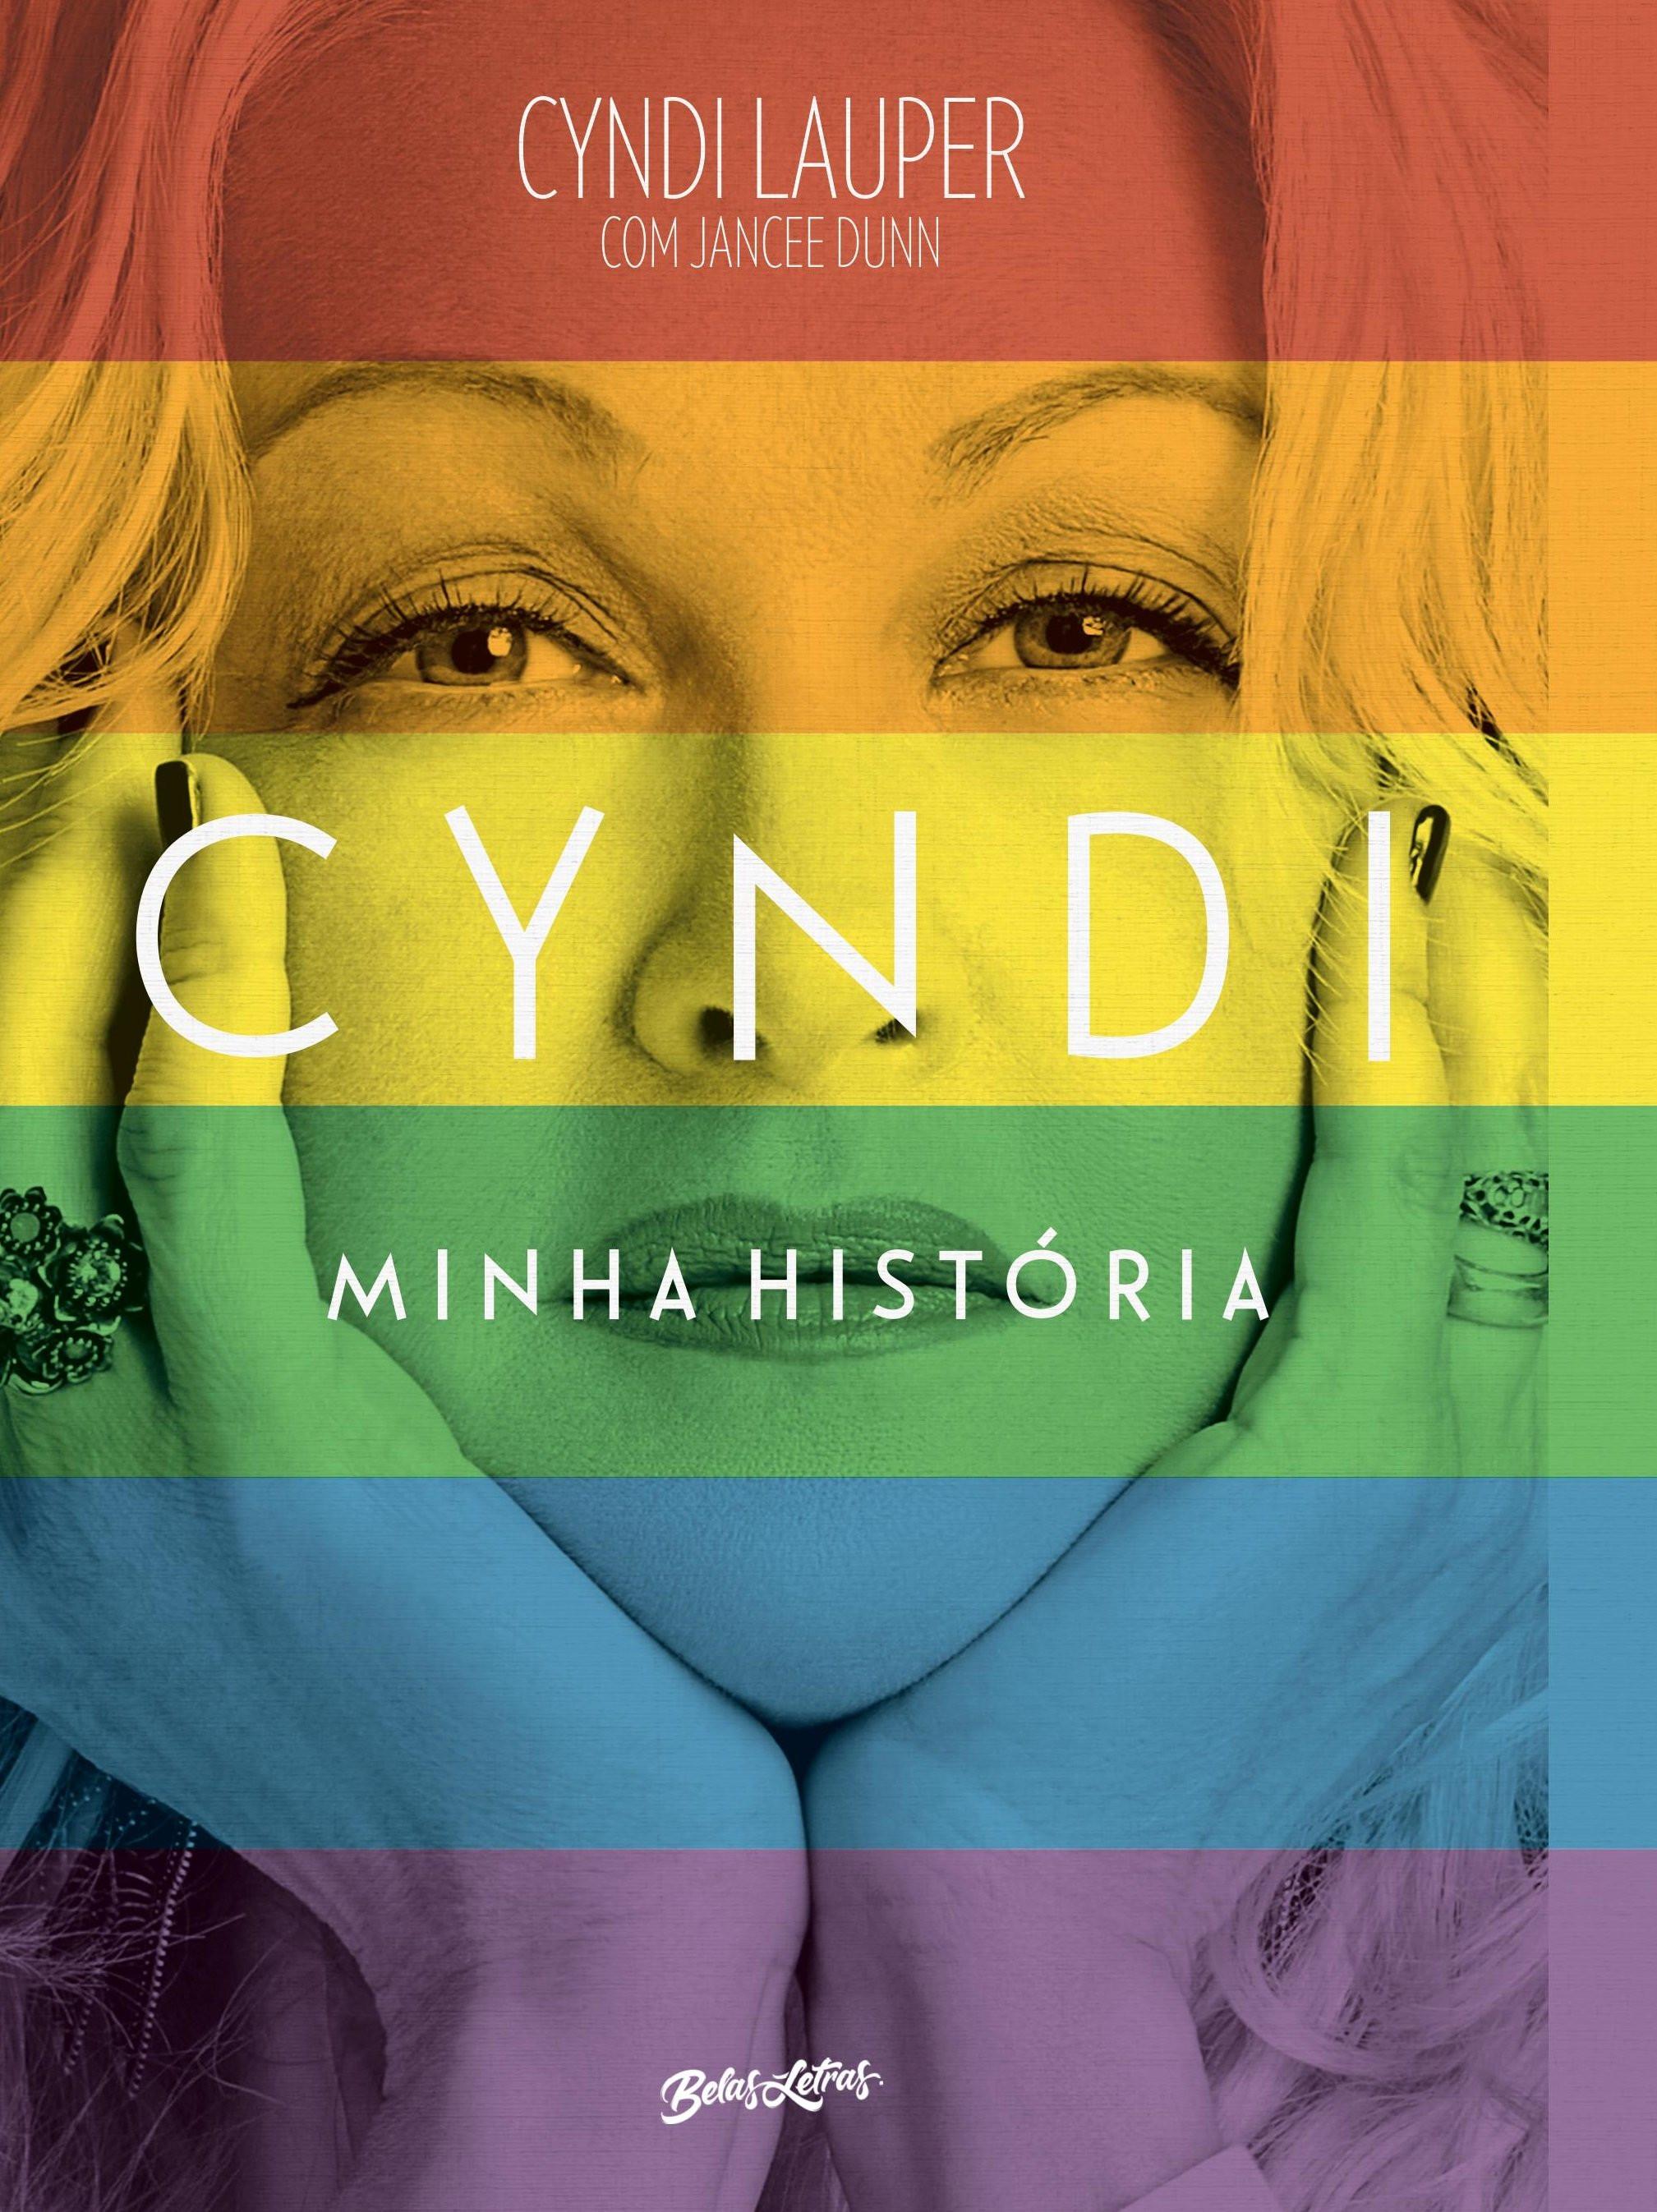 CYNDI: MINHA HISTÓRIA - CYNDI LAUPER